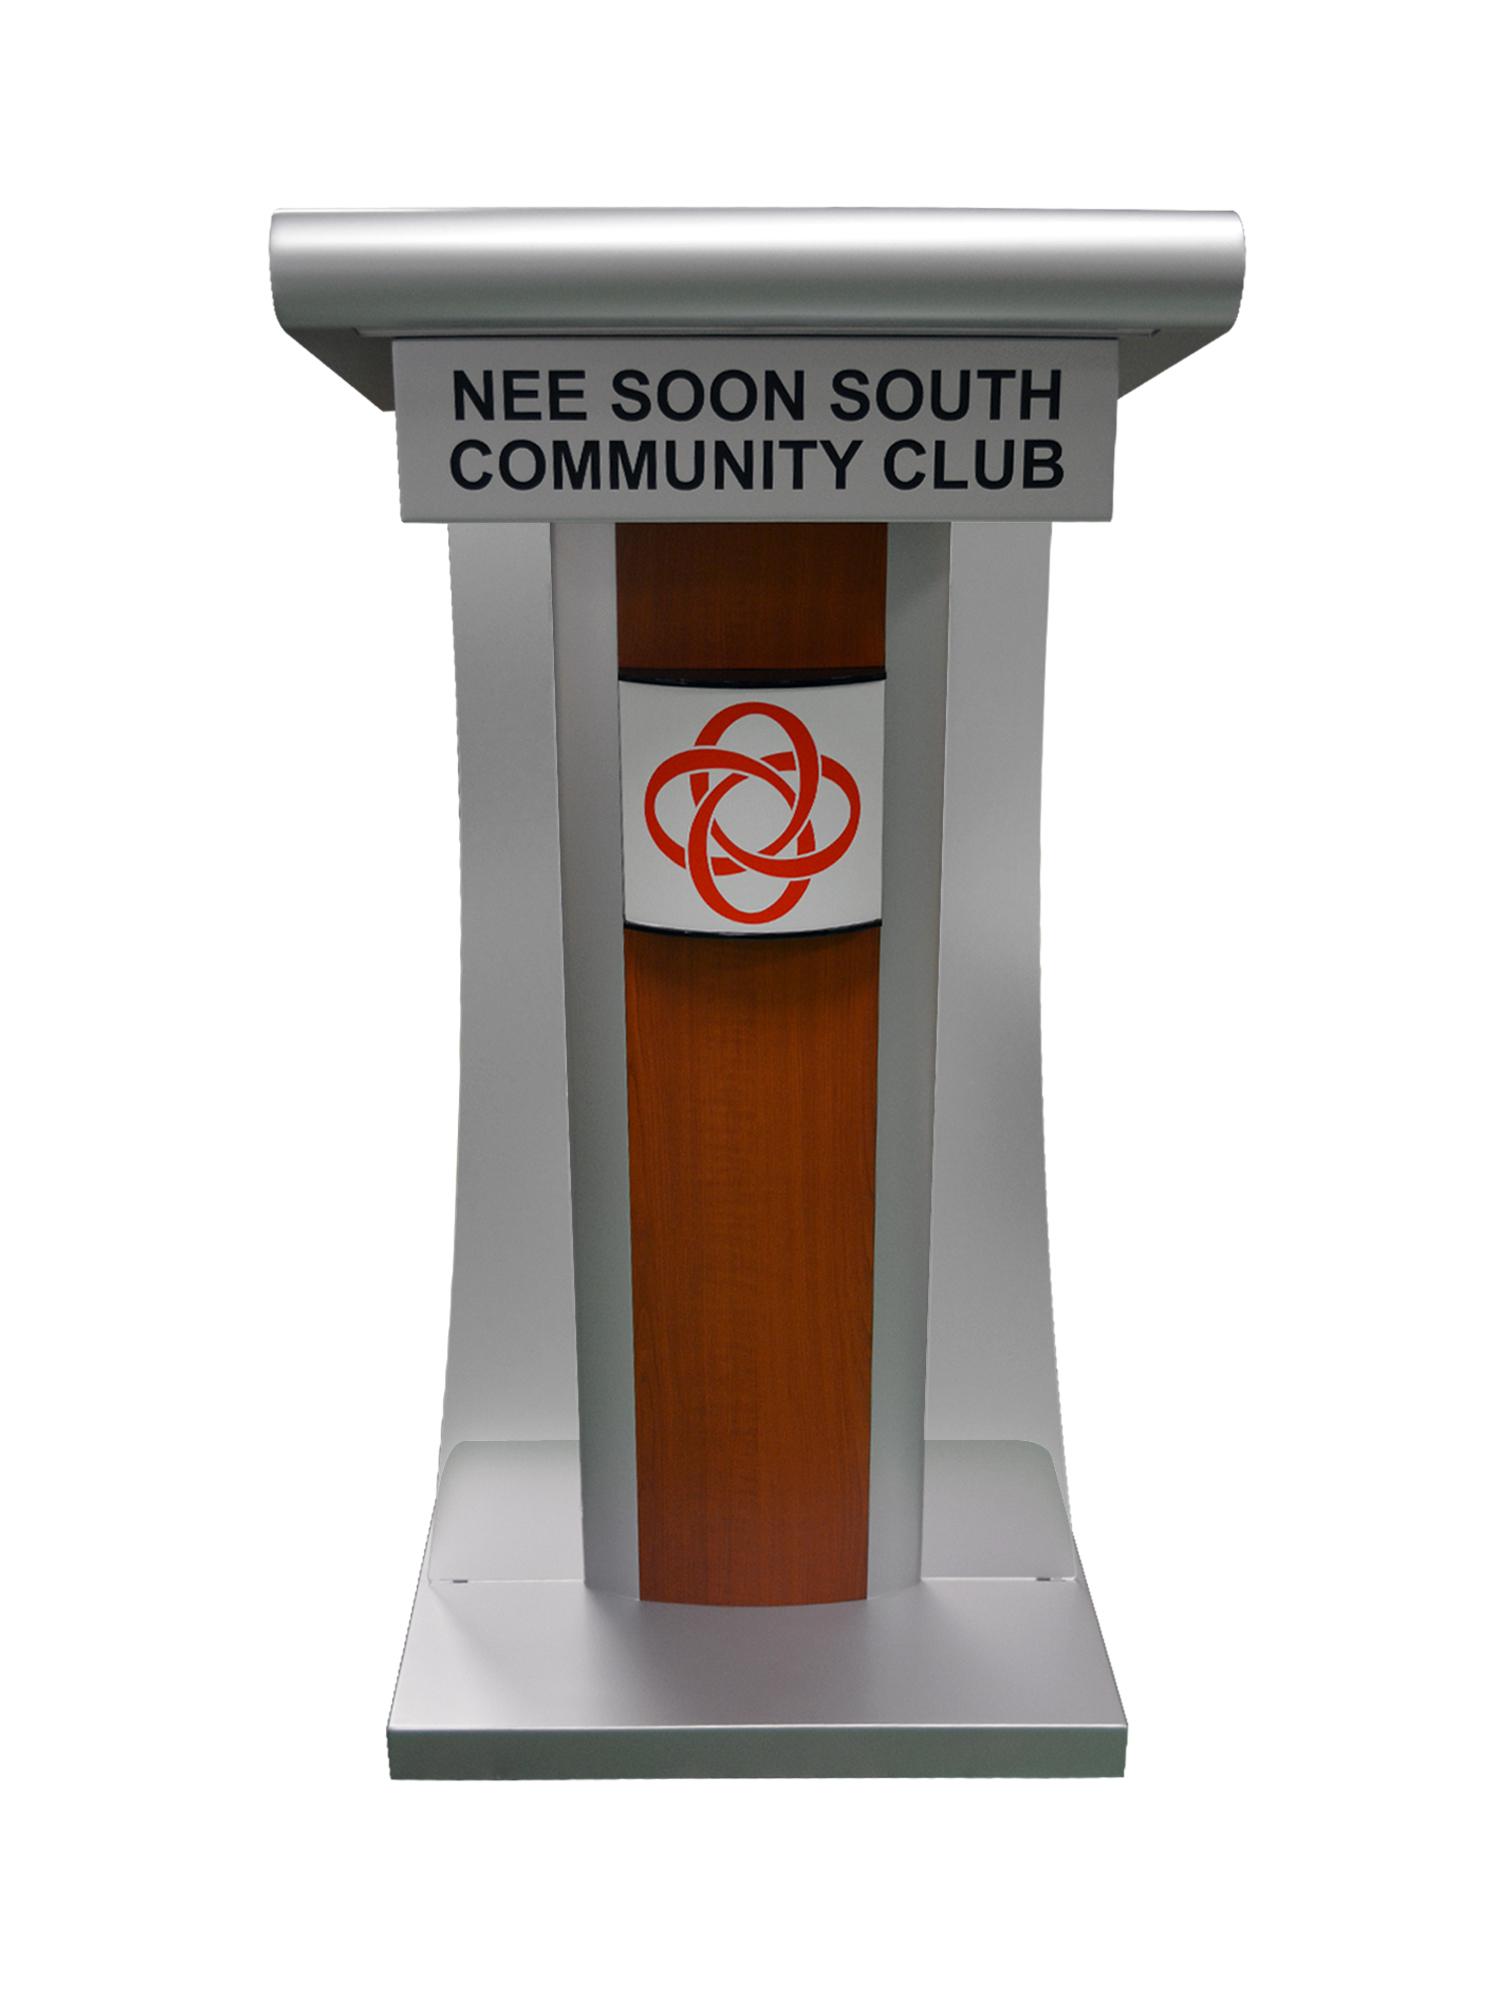 Nee Soon South Community Club